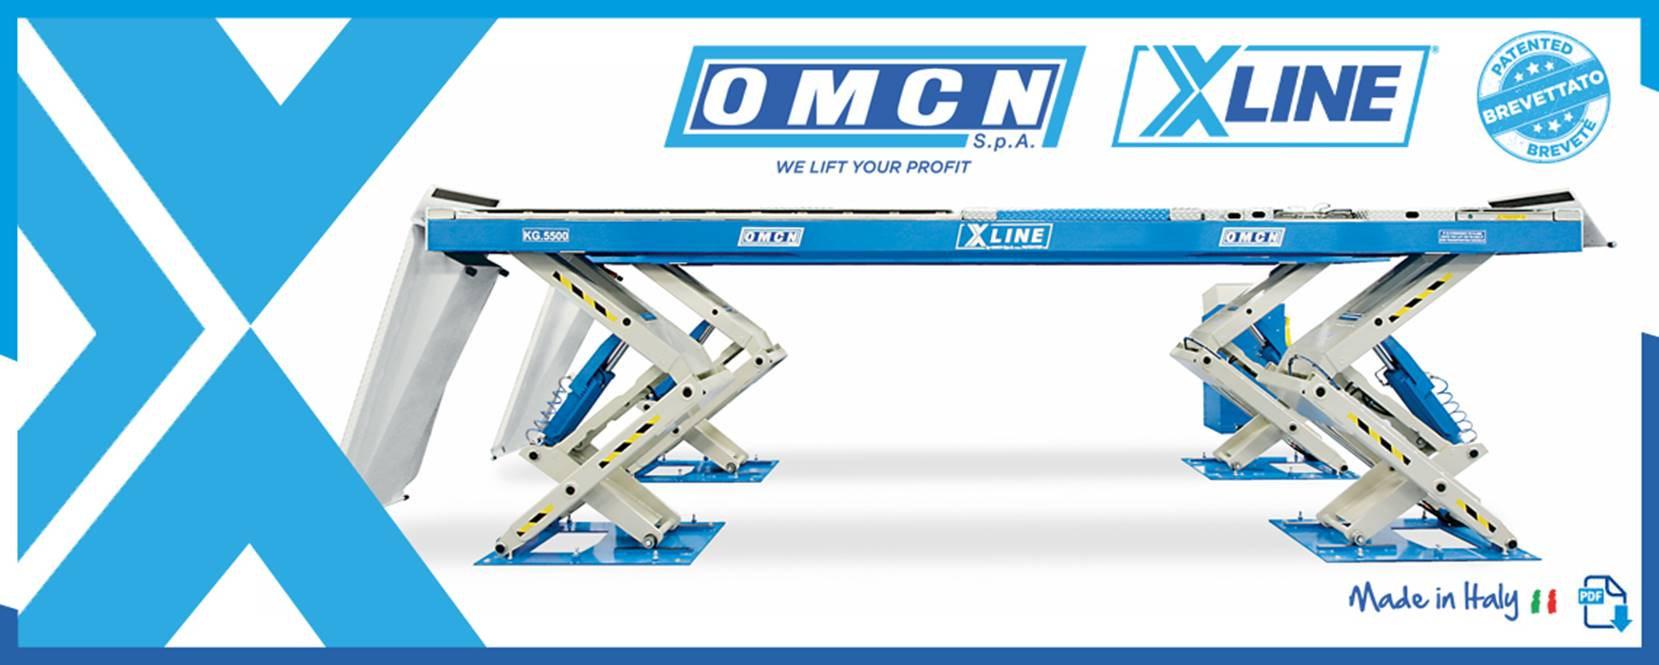 XLine OMCN